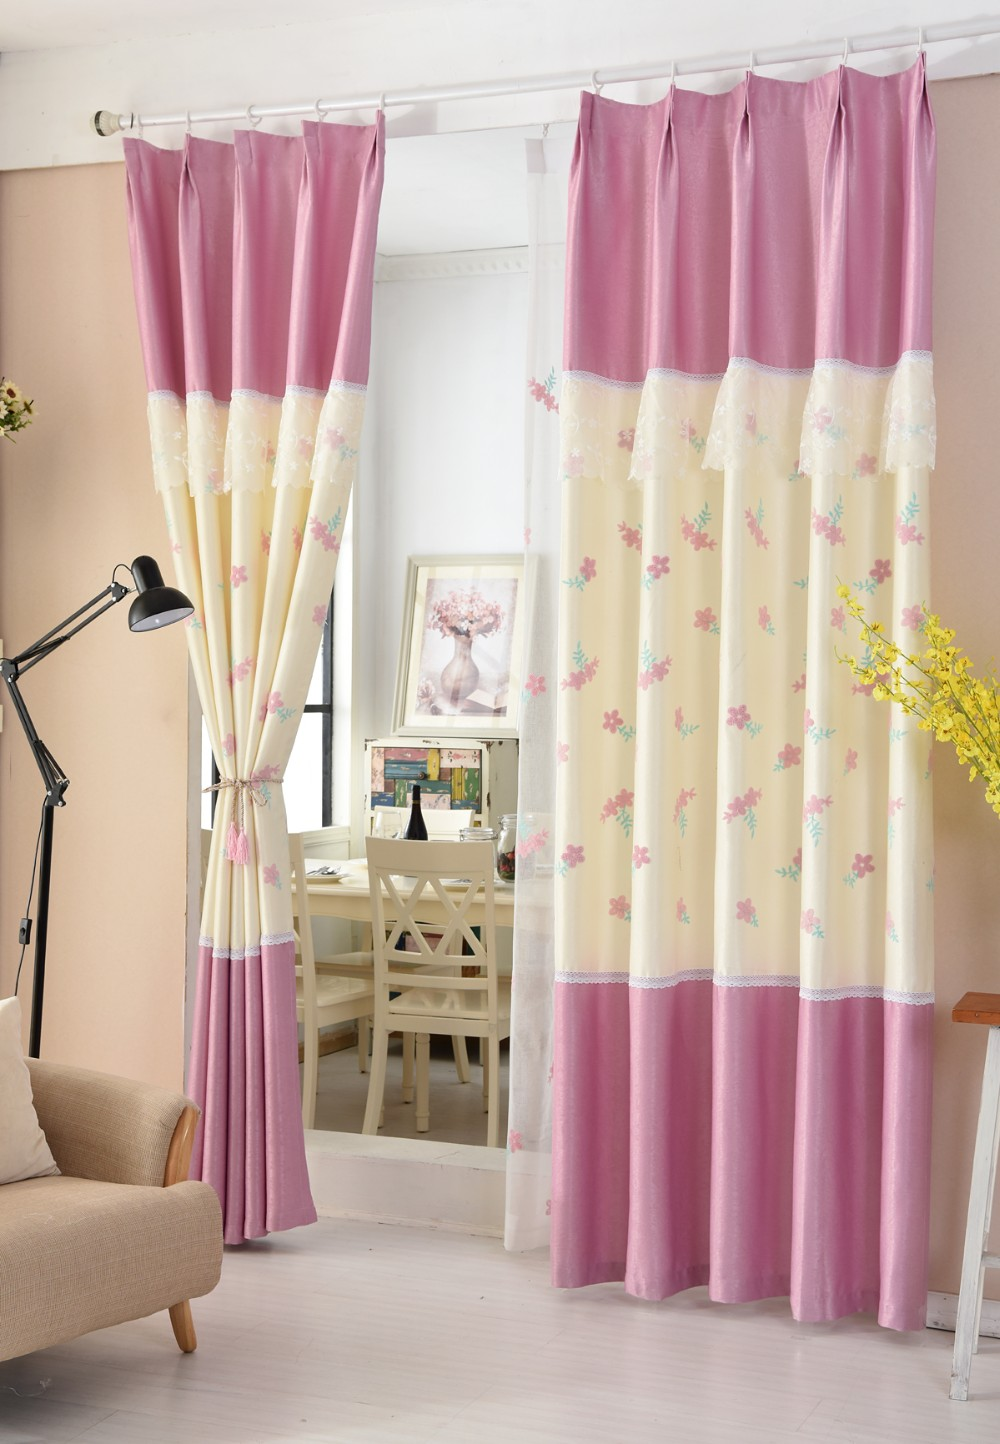 Kinderkamer Roze. Roze Luchtballon With Kinderkamer Roze. Gallery Of ...